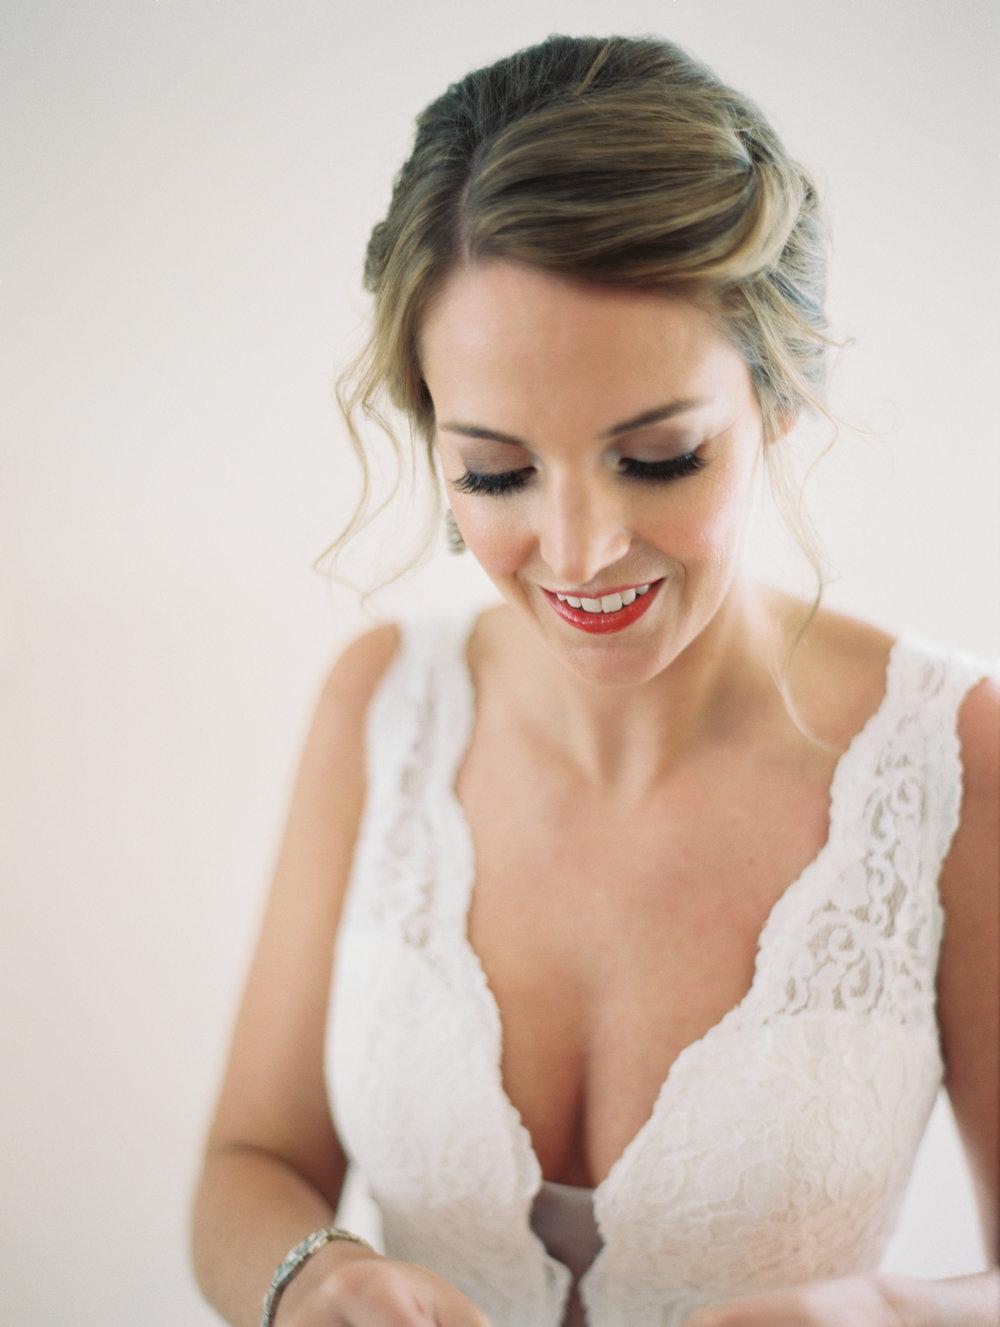 090-fine-art-film-photographer-carmel-california-destination-wedding-brumley-wells-tim-courtney.jpg